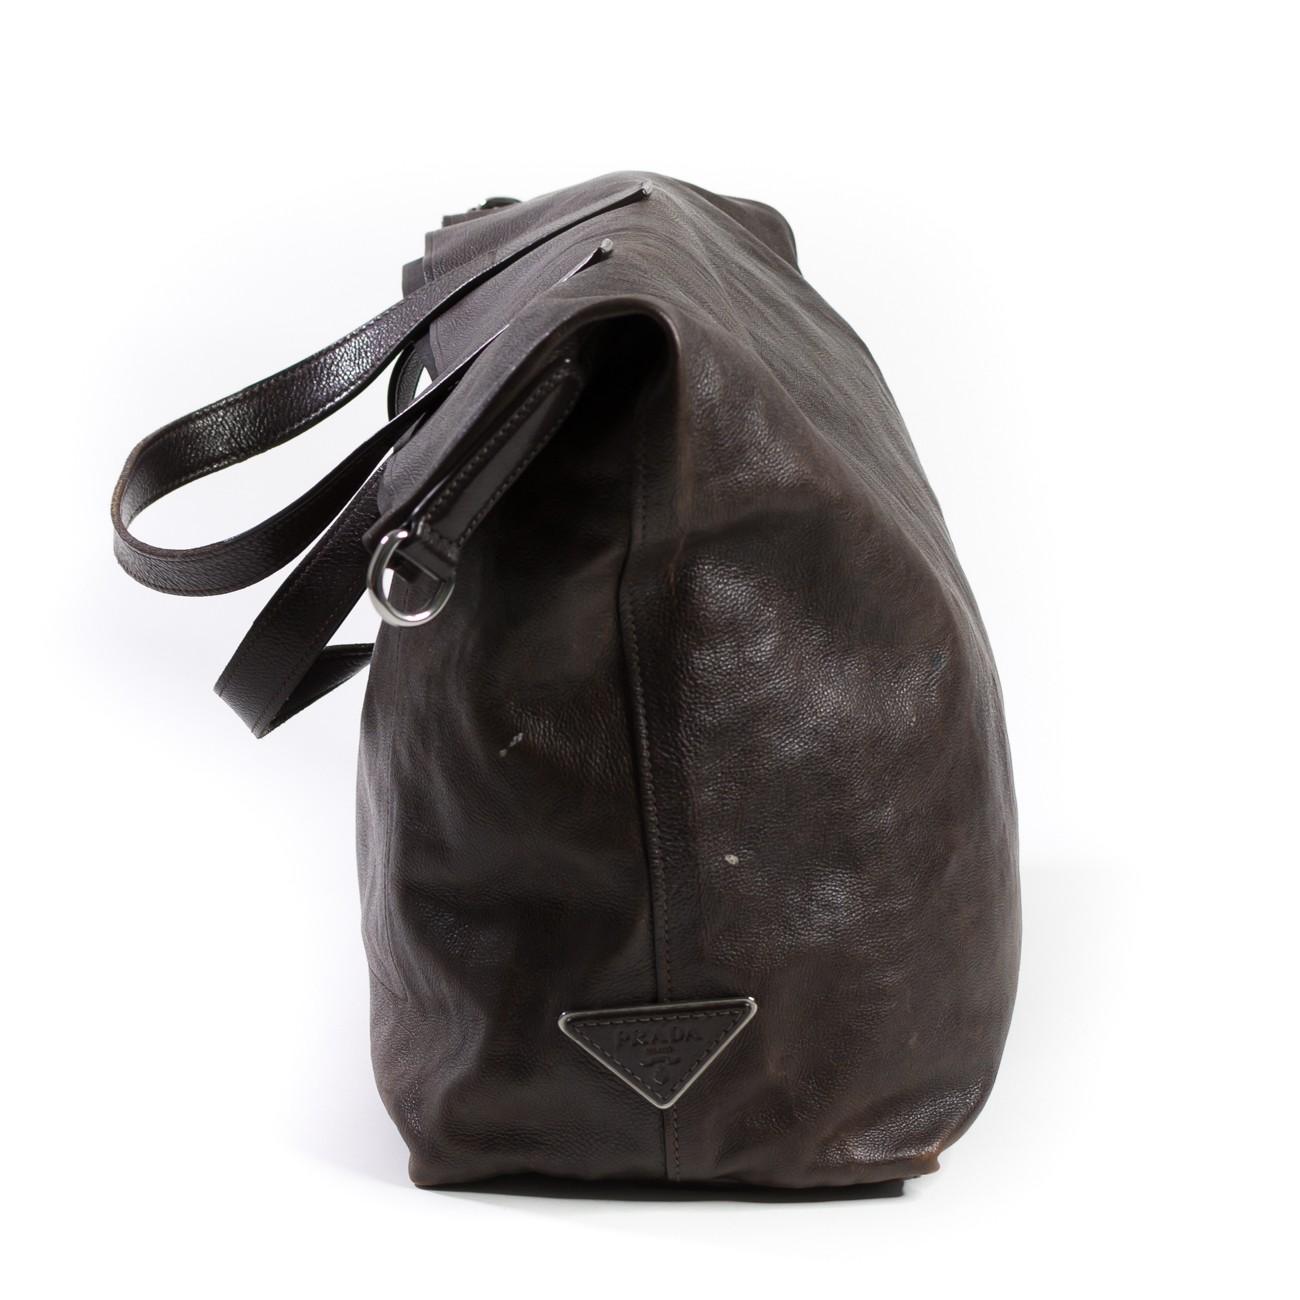 bd41aa02316e Prada Calfskin Dark Brown Leather Shoulder Bag